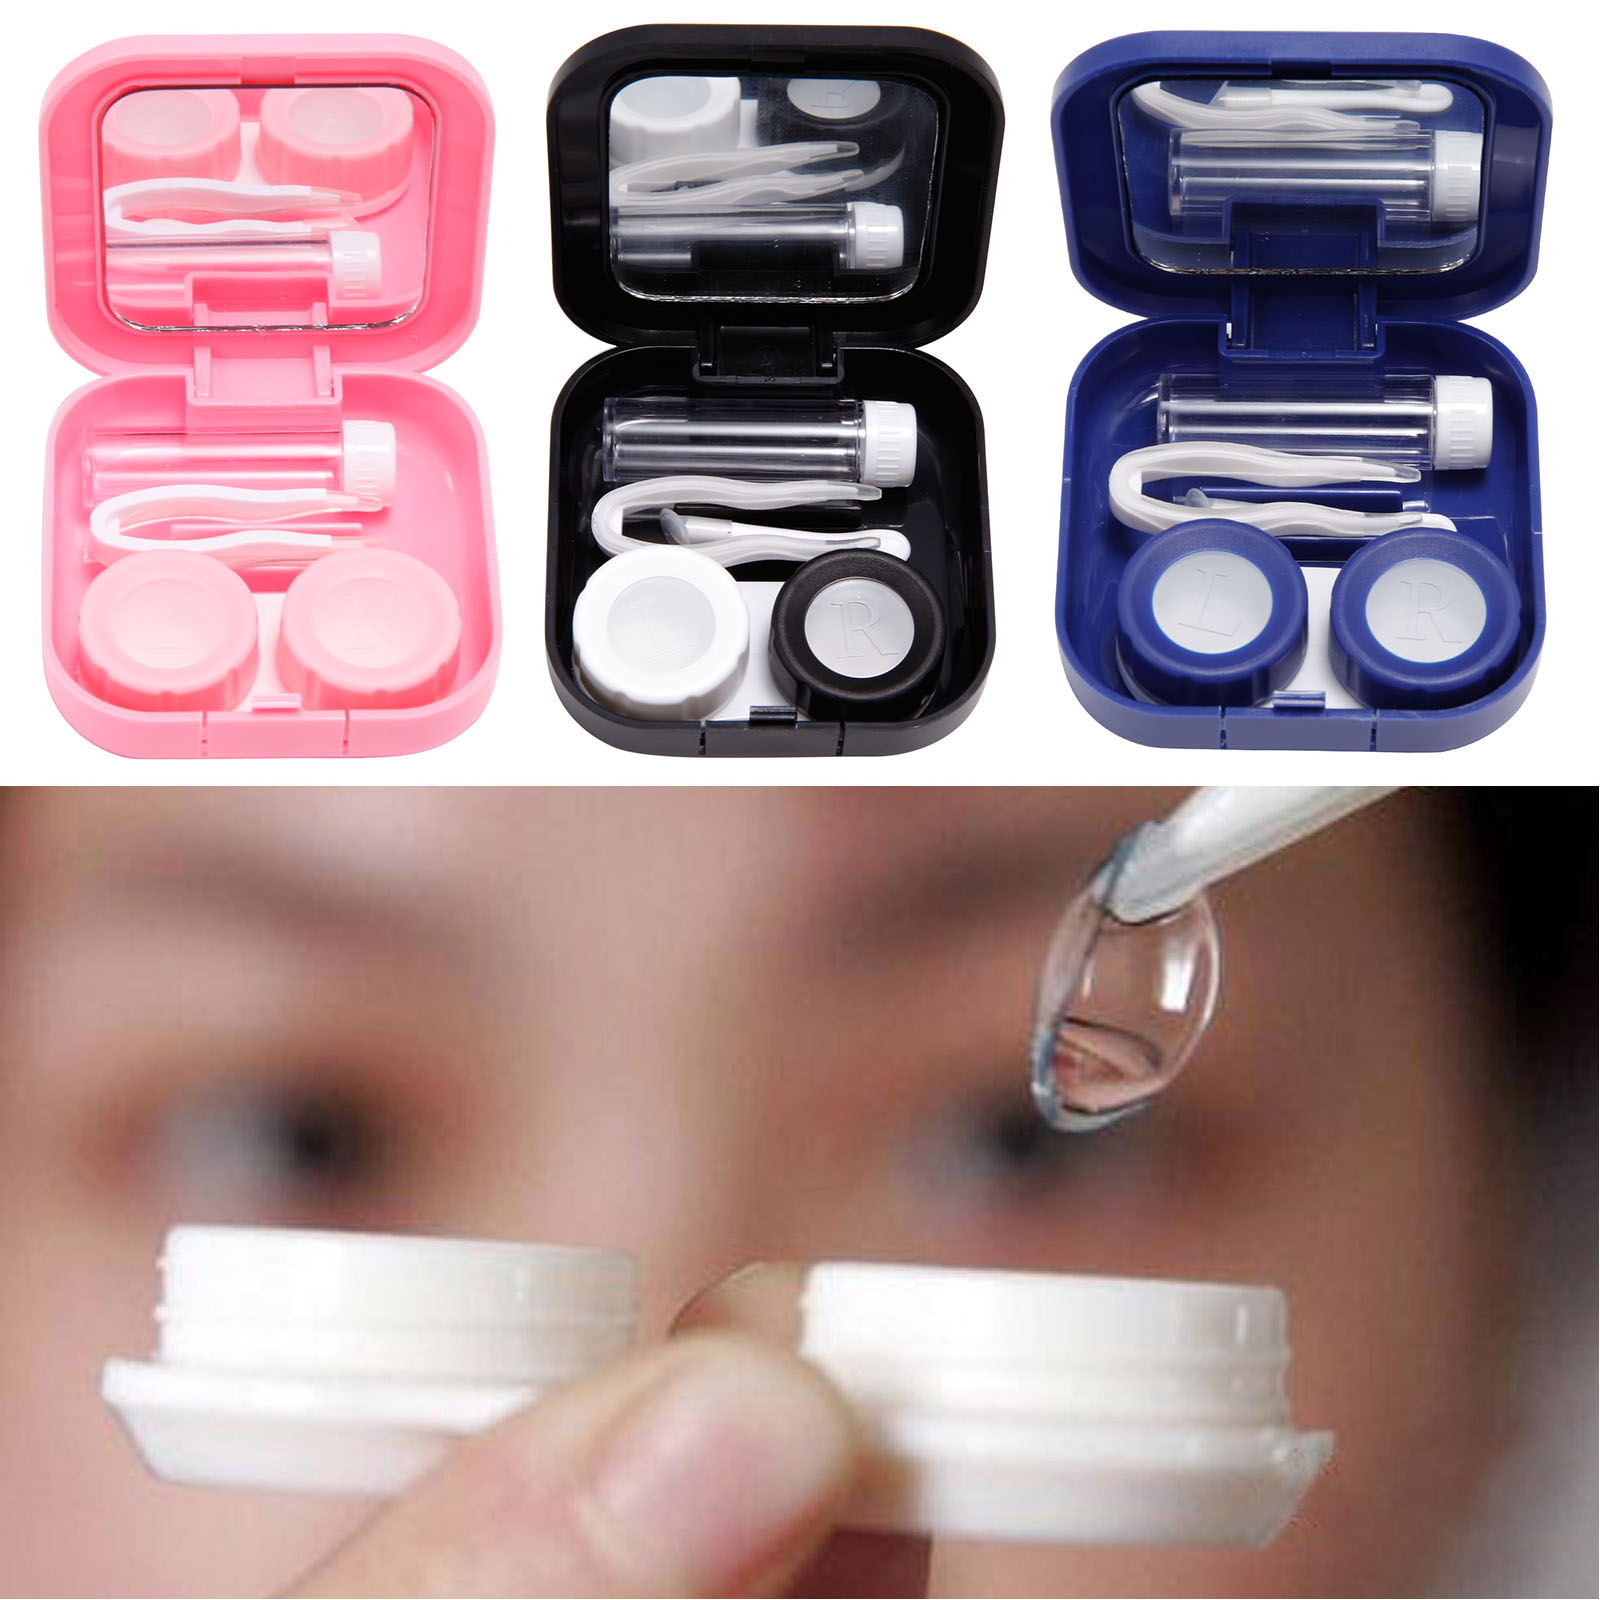 Estuche caja port til para lentillas lente de contacto - Estuche para lentillas ...